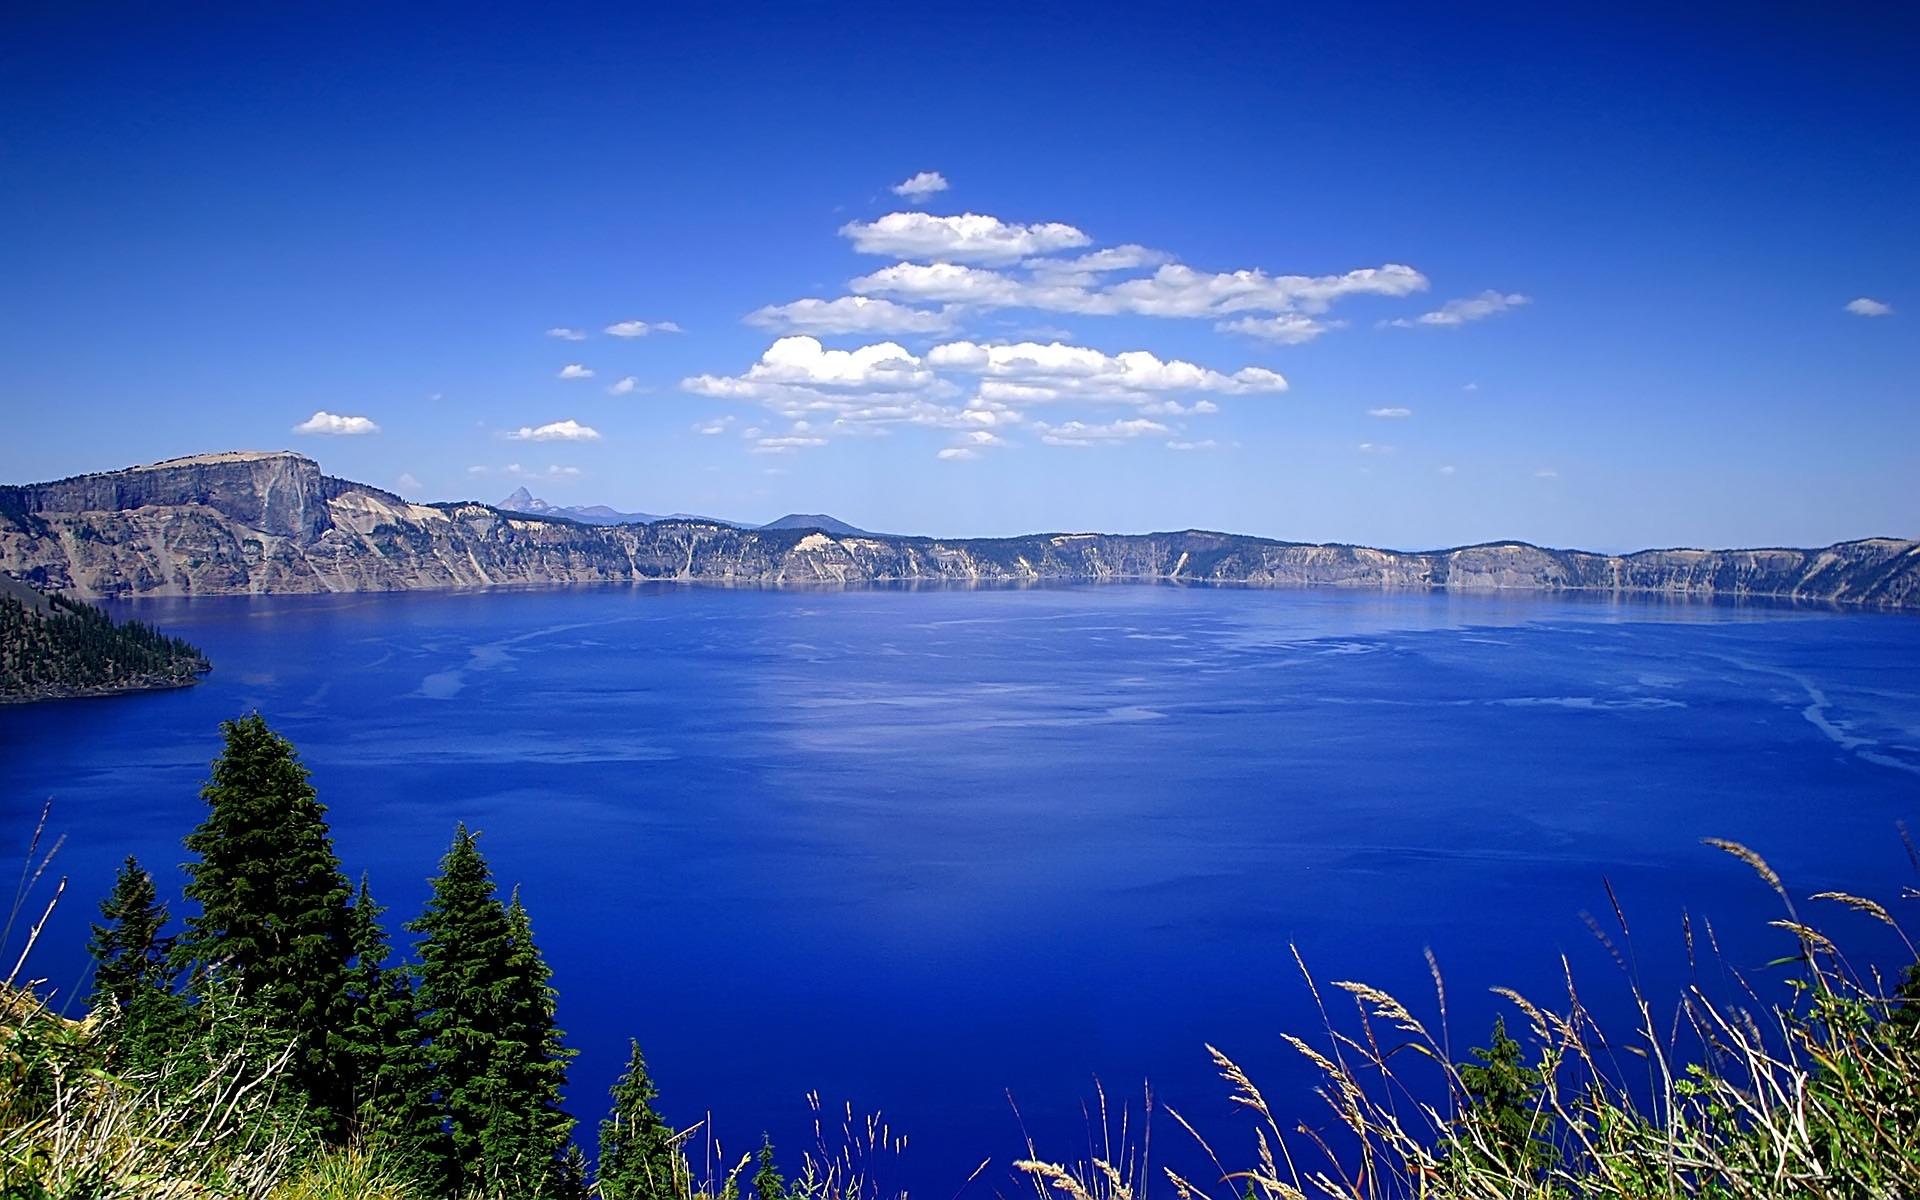 Best Wallpaper Marble Landscape - blue_lake_wallpaper_landscape_nature_1400  2018_908062.jpg